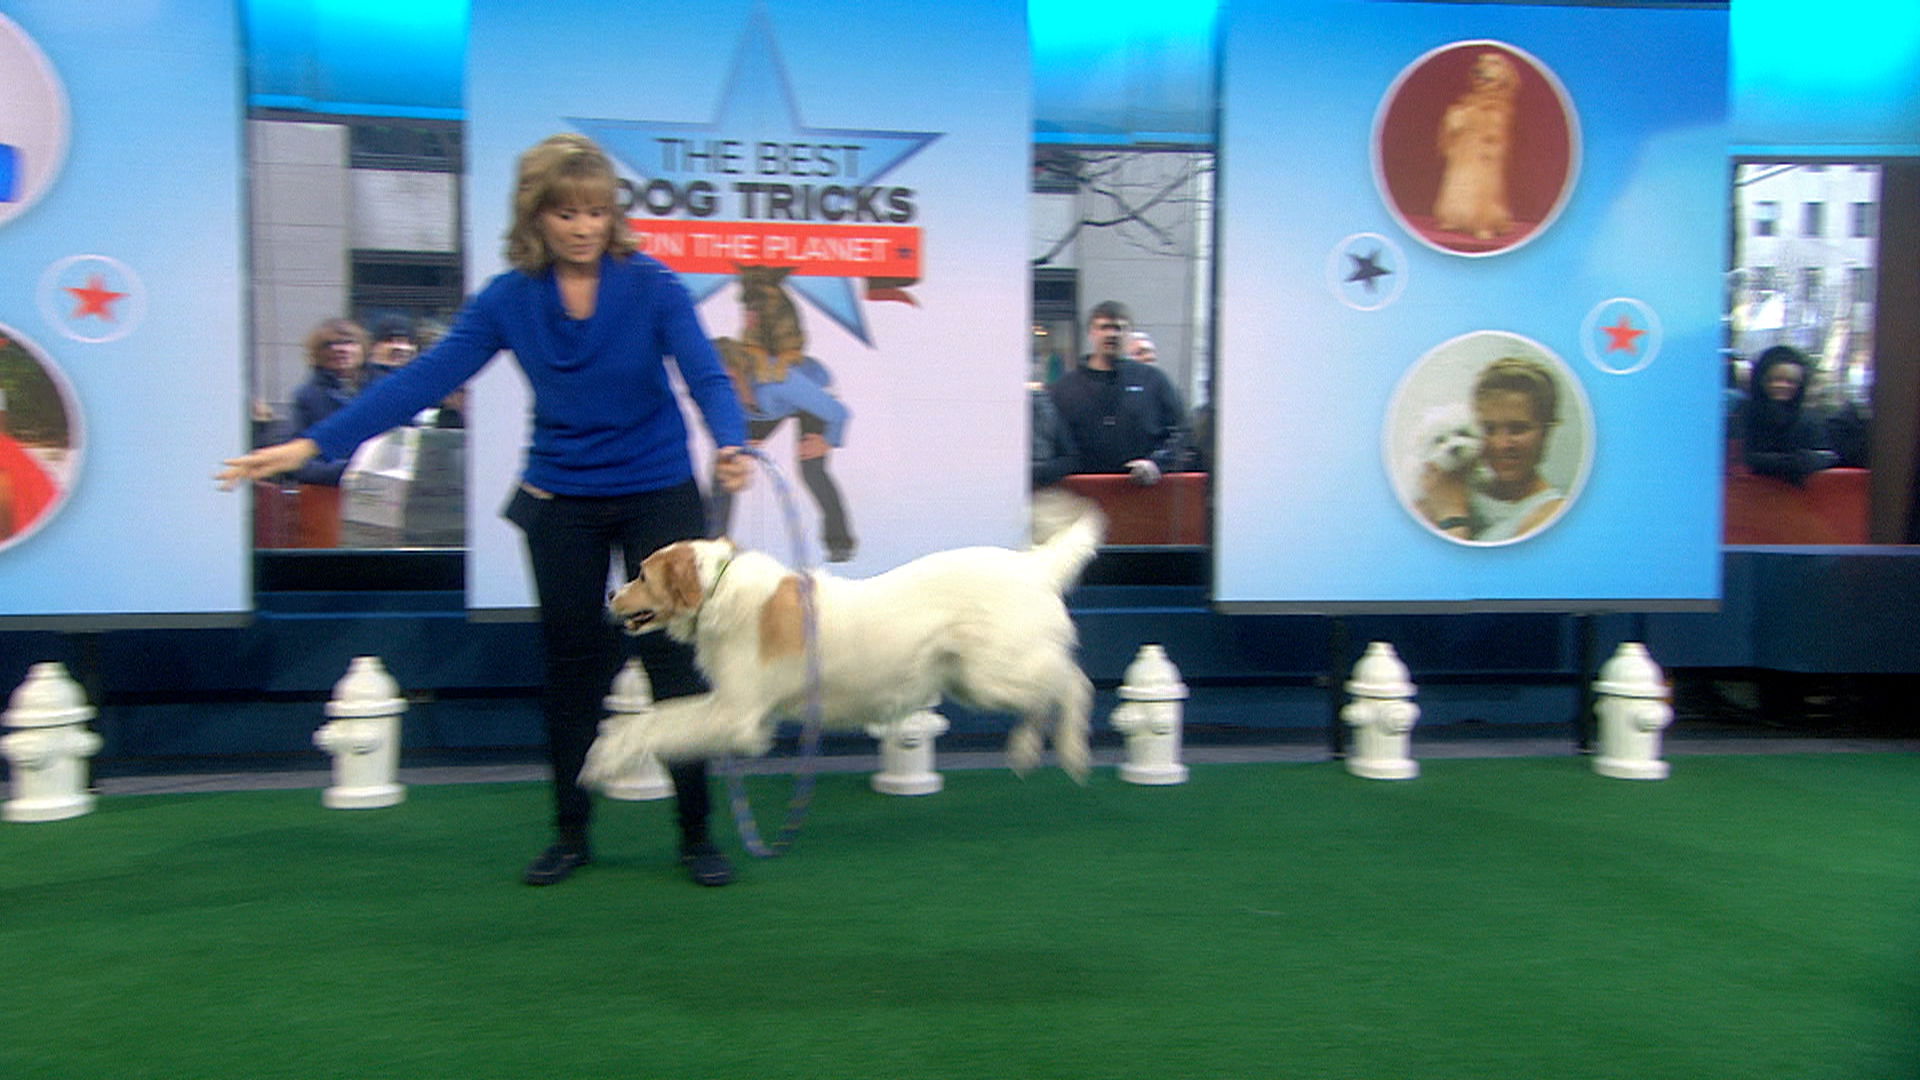 10 Fun, Impressive Tricks You Can Teach Any Dog - Dogtime